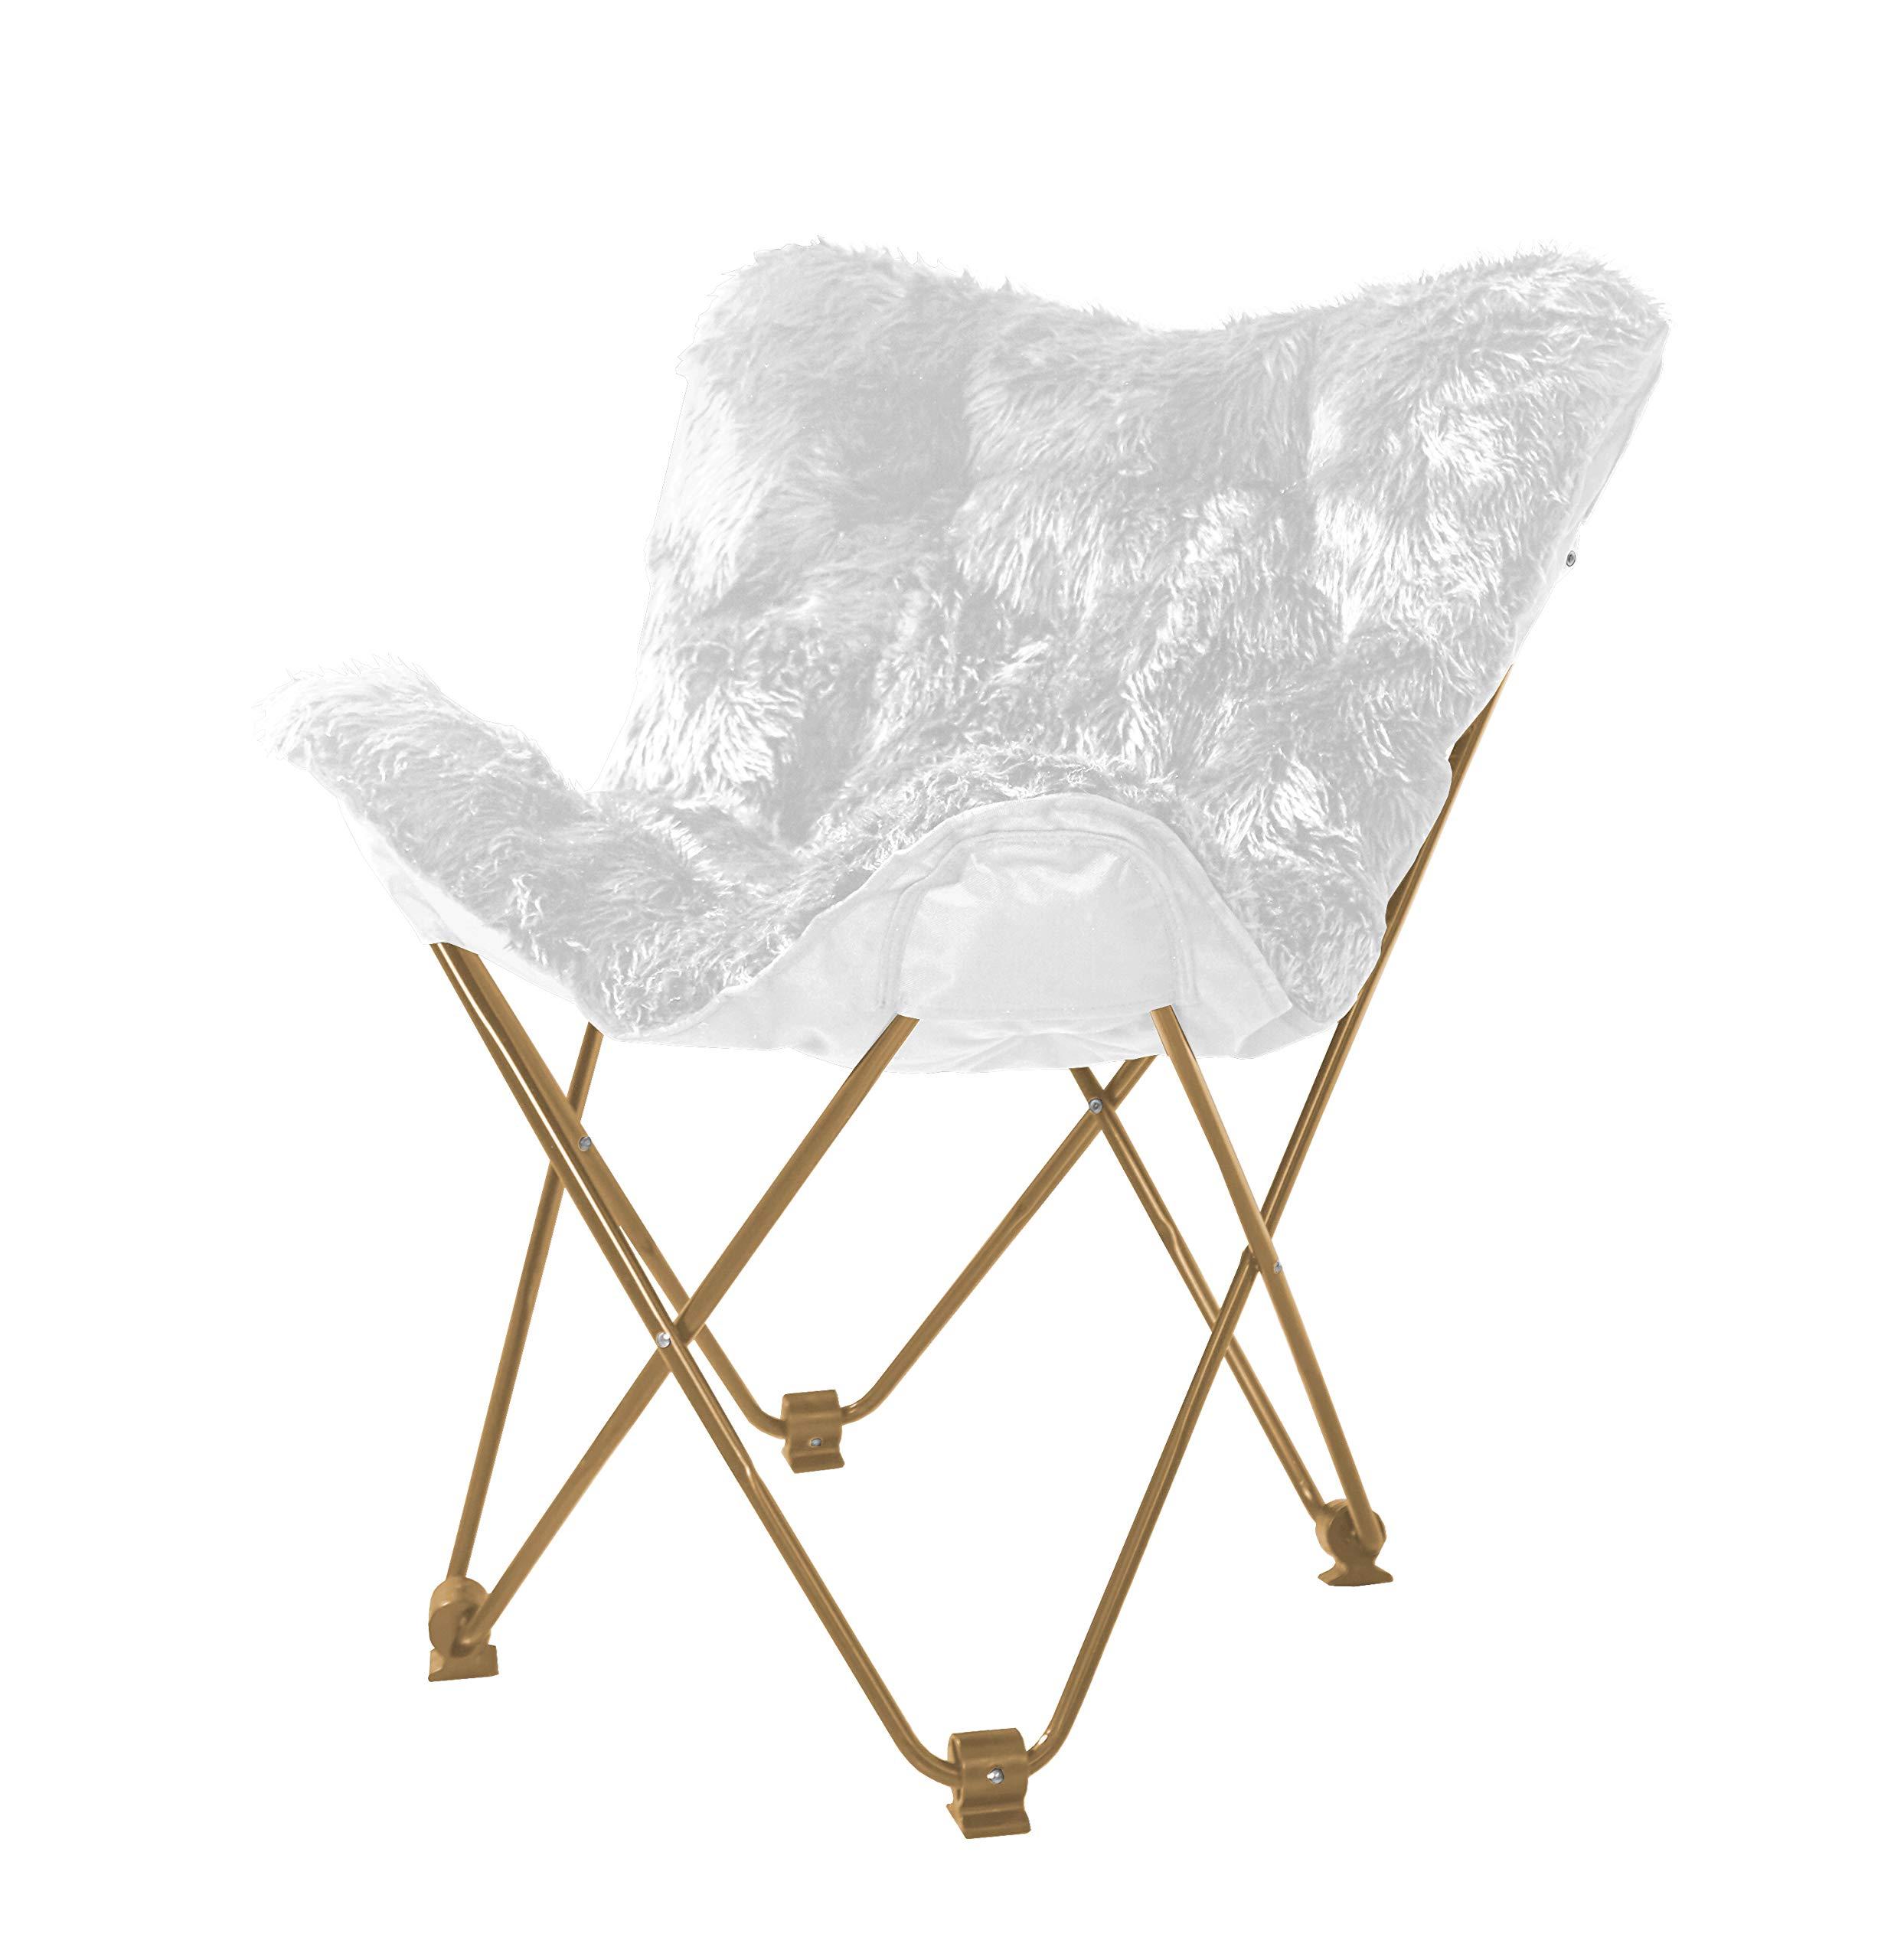 Urban Shop WK657560 Mongolian Butterfly Chair, White by Urban Shop